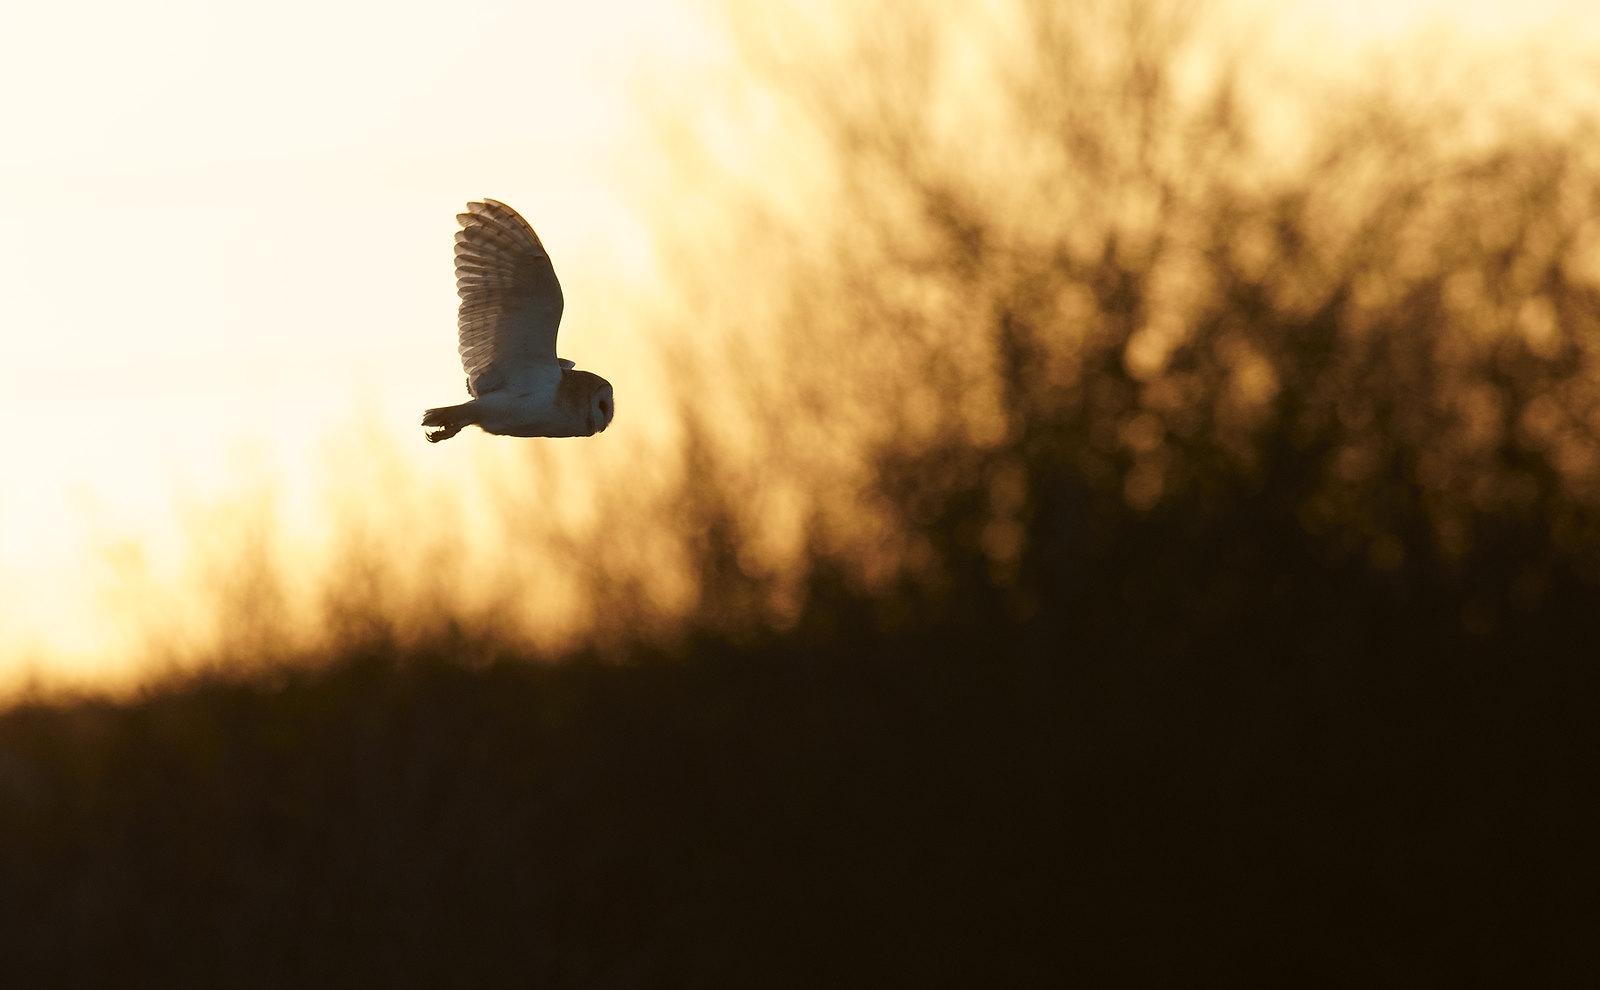 Barn Owl - interesting and evocative lighting